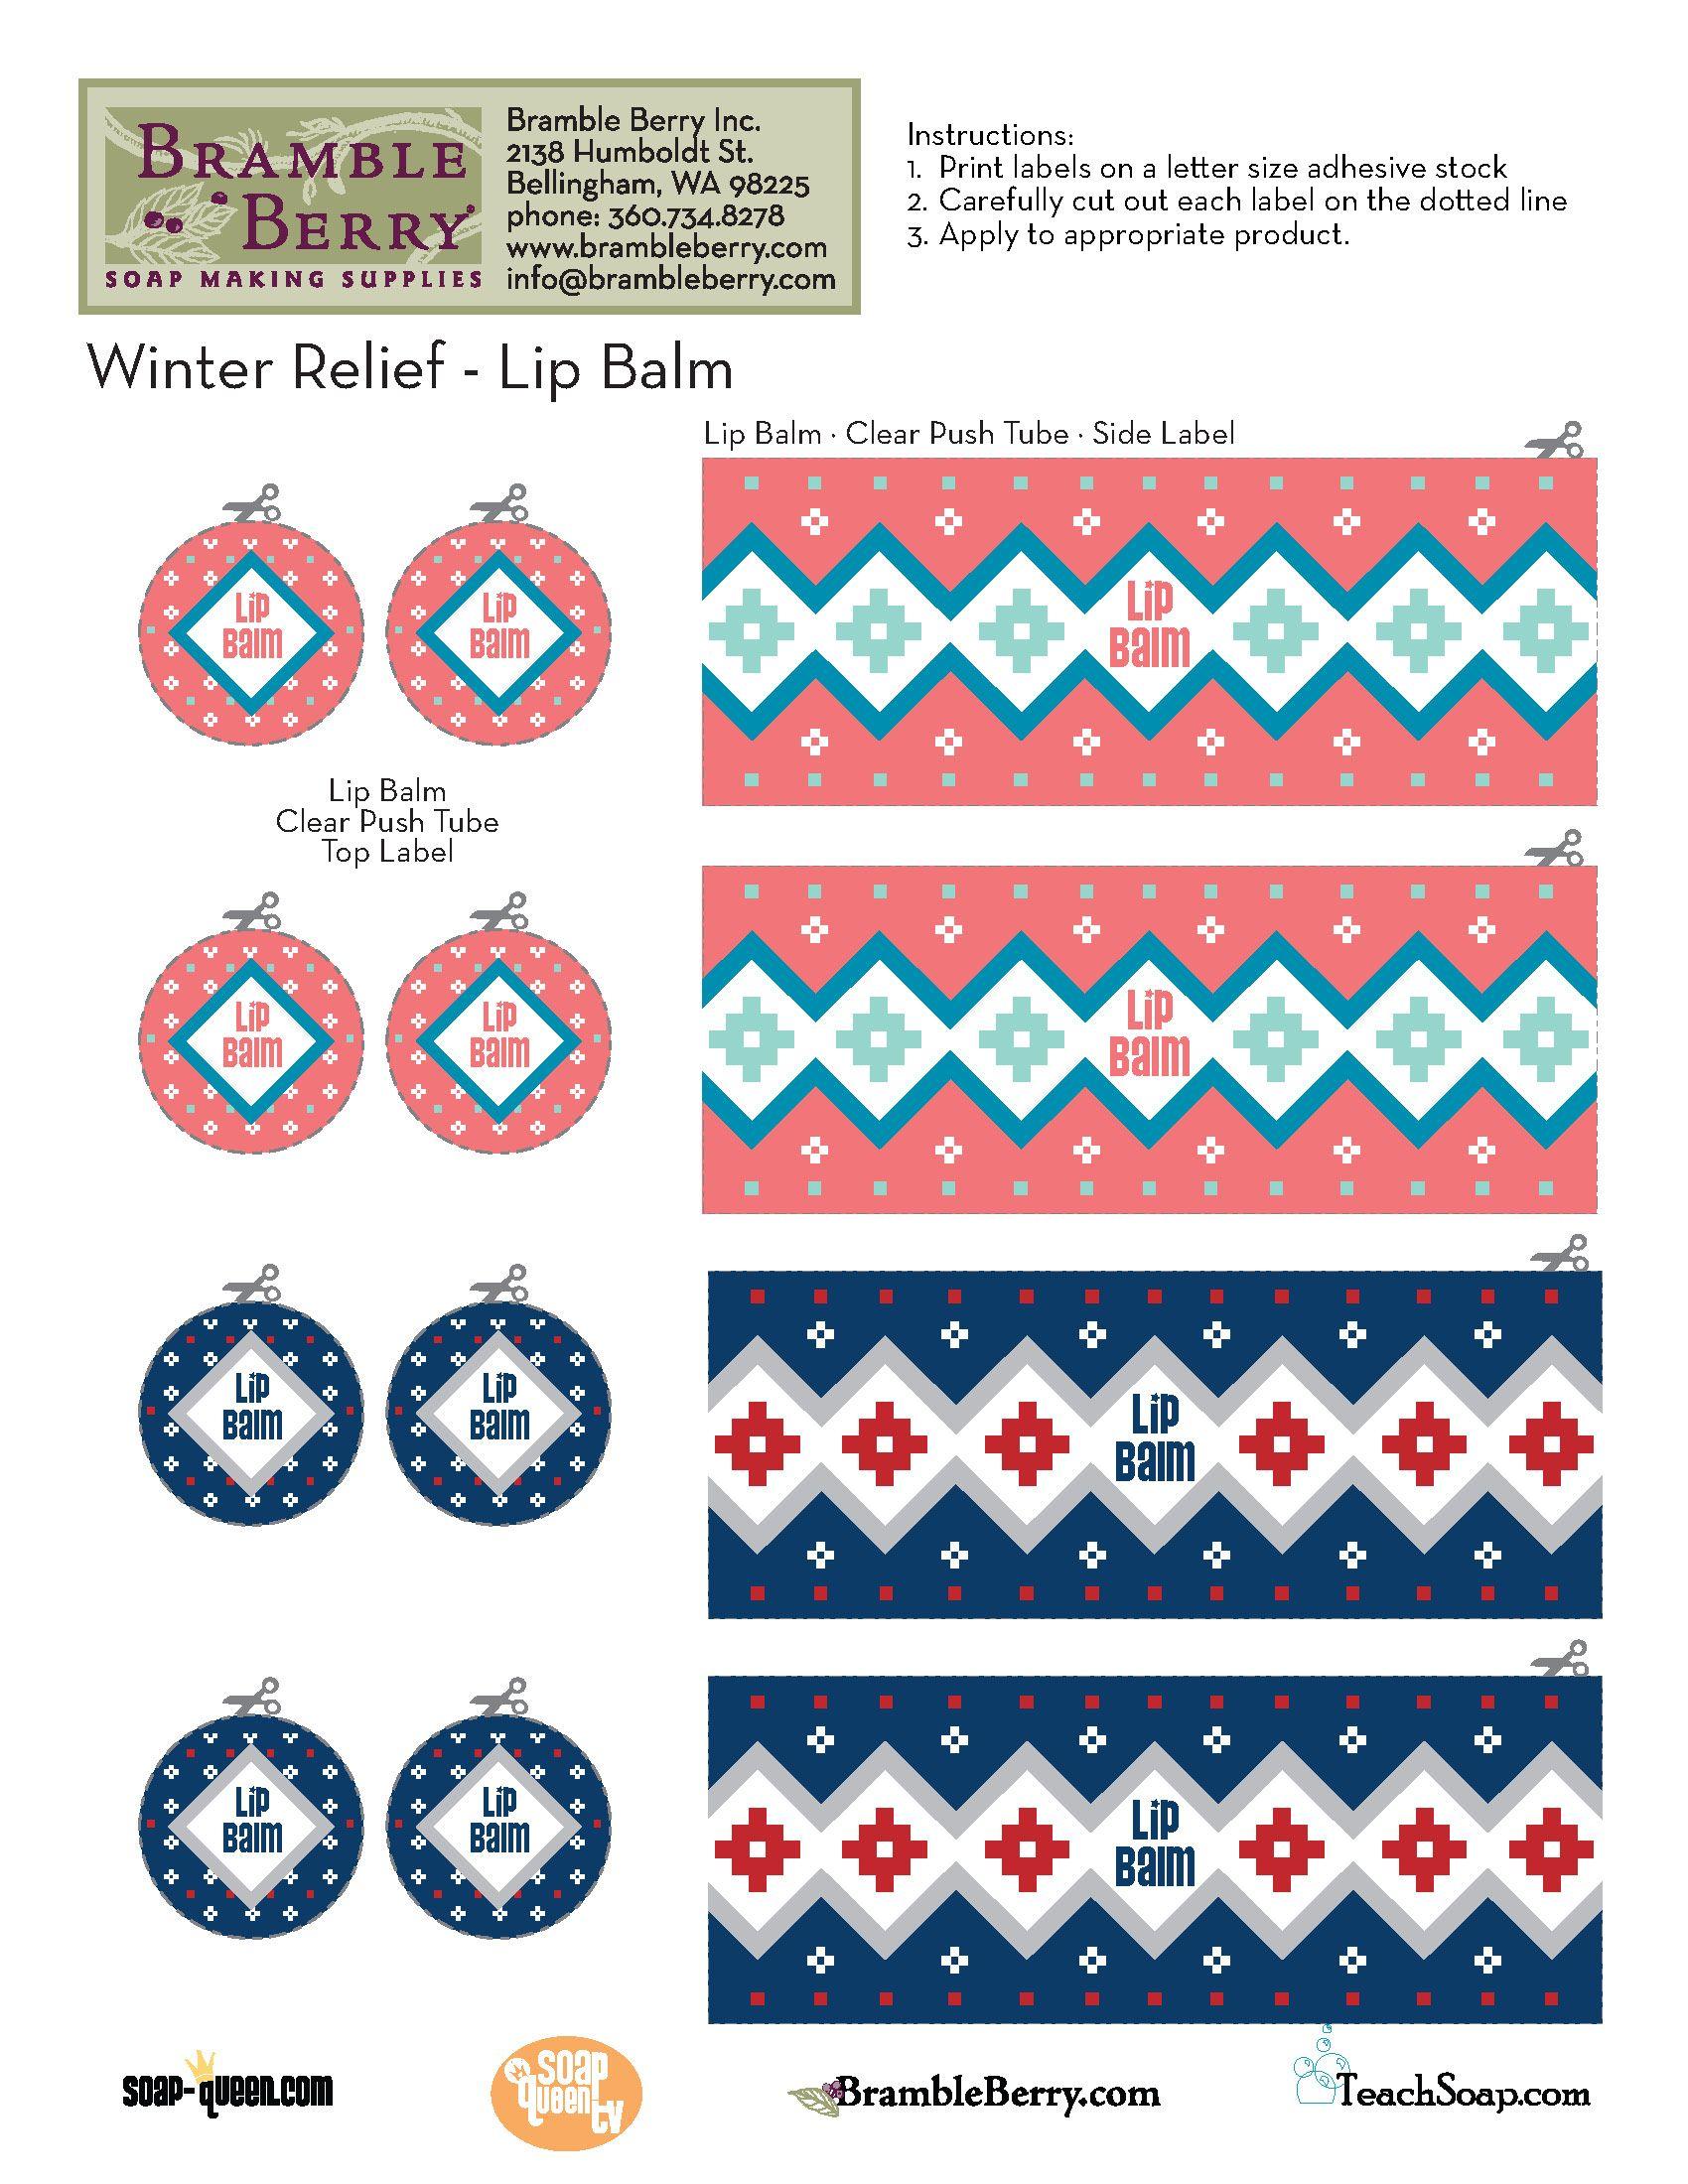 printed lip balm label template winter relief lip balm template free pdf bramble berry. Black Bedroom Furniture Sets. Home Design Ideas